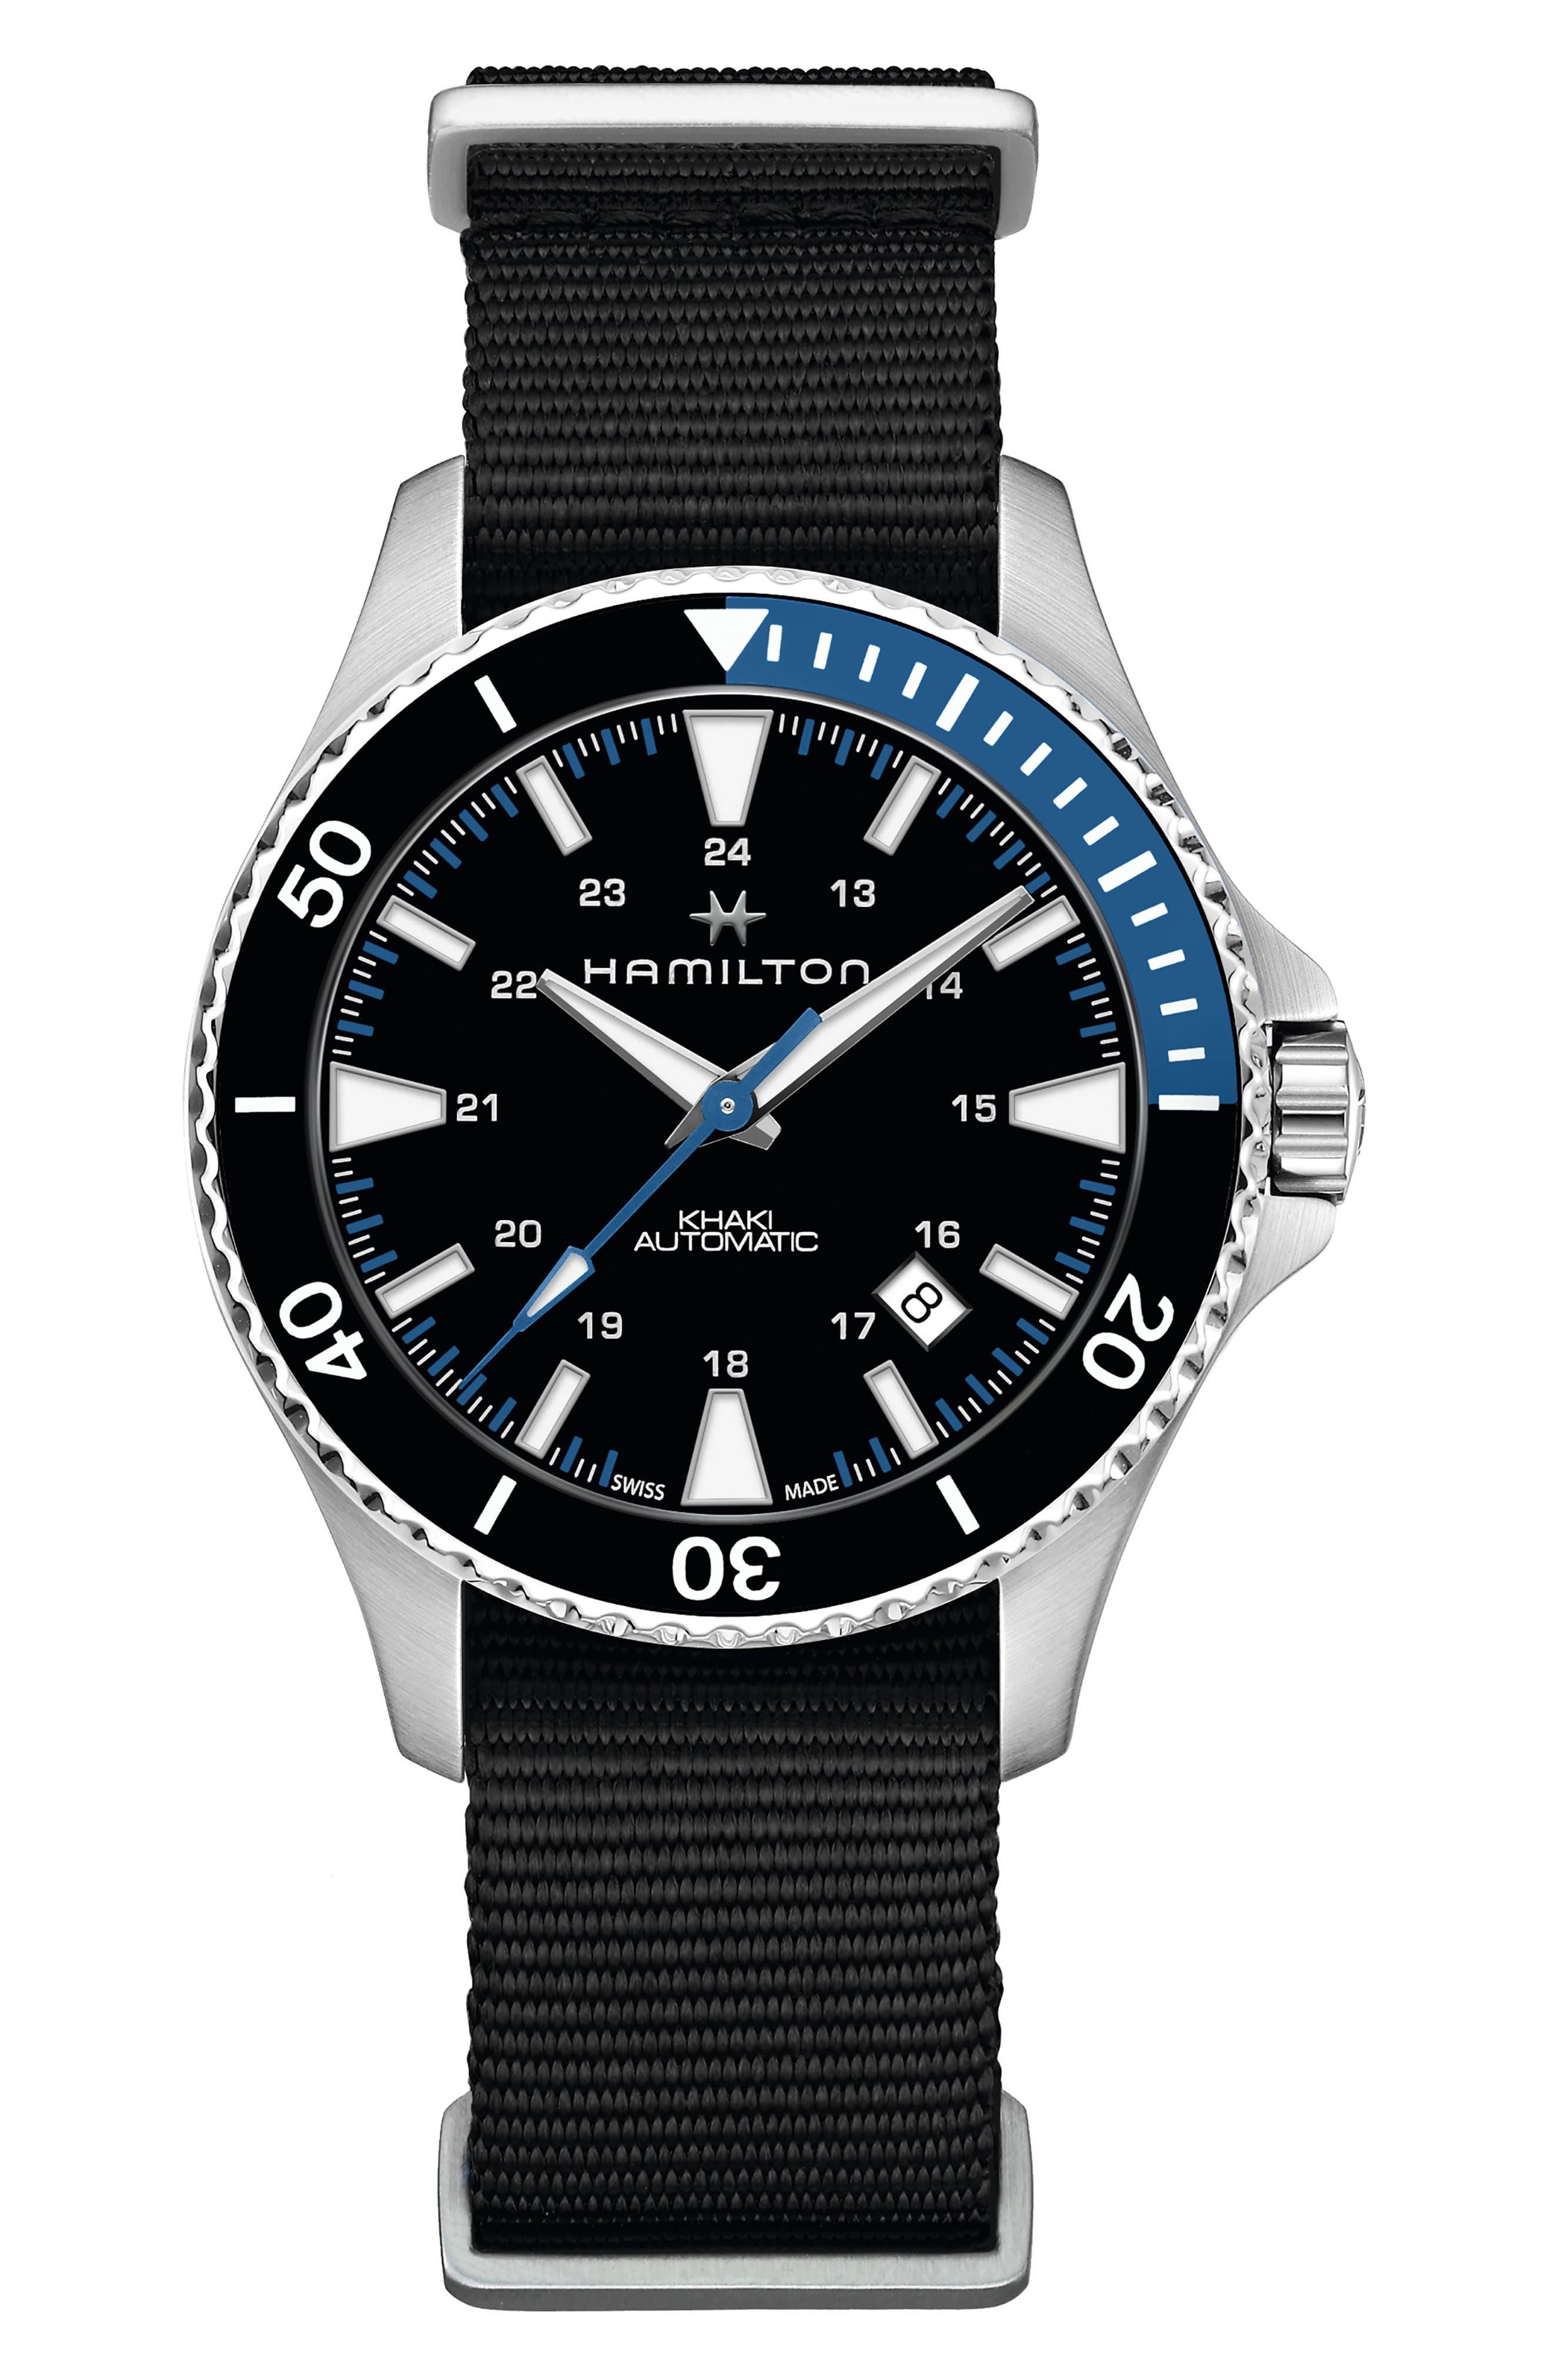 Khaki Navy Scuba Automatic Canvas Strap Watch, 40mm,                             Main thumbnail 1, color,                             BLACK/ SILVER/ BLUE